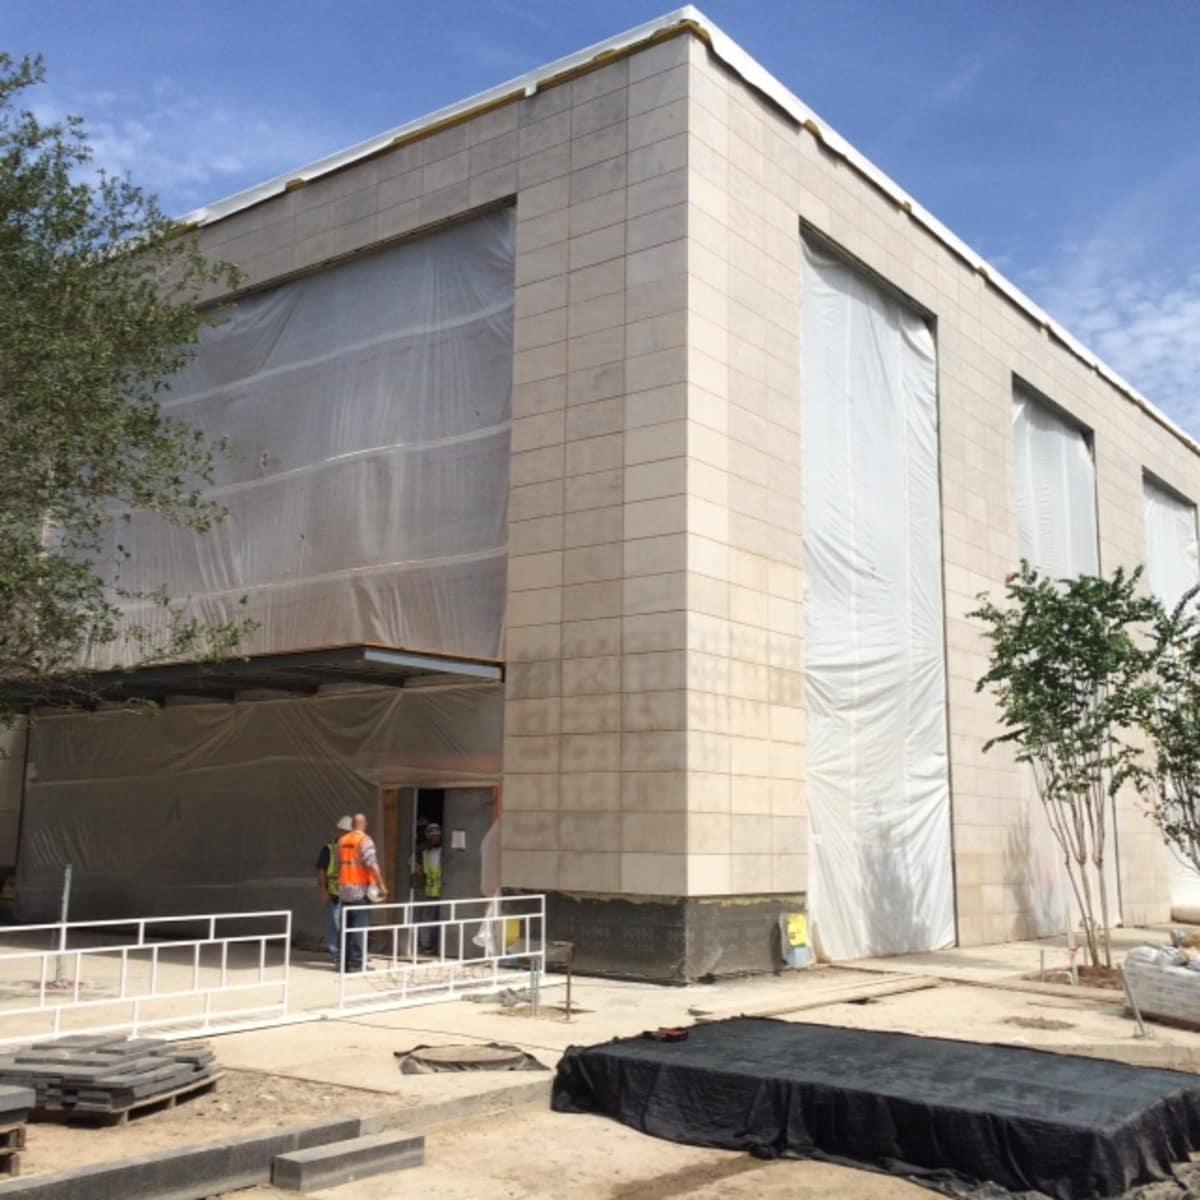 Dior building under construction at River Oaks District